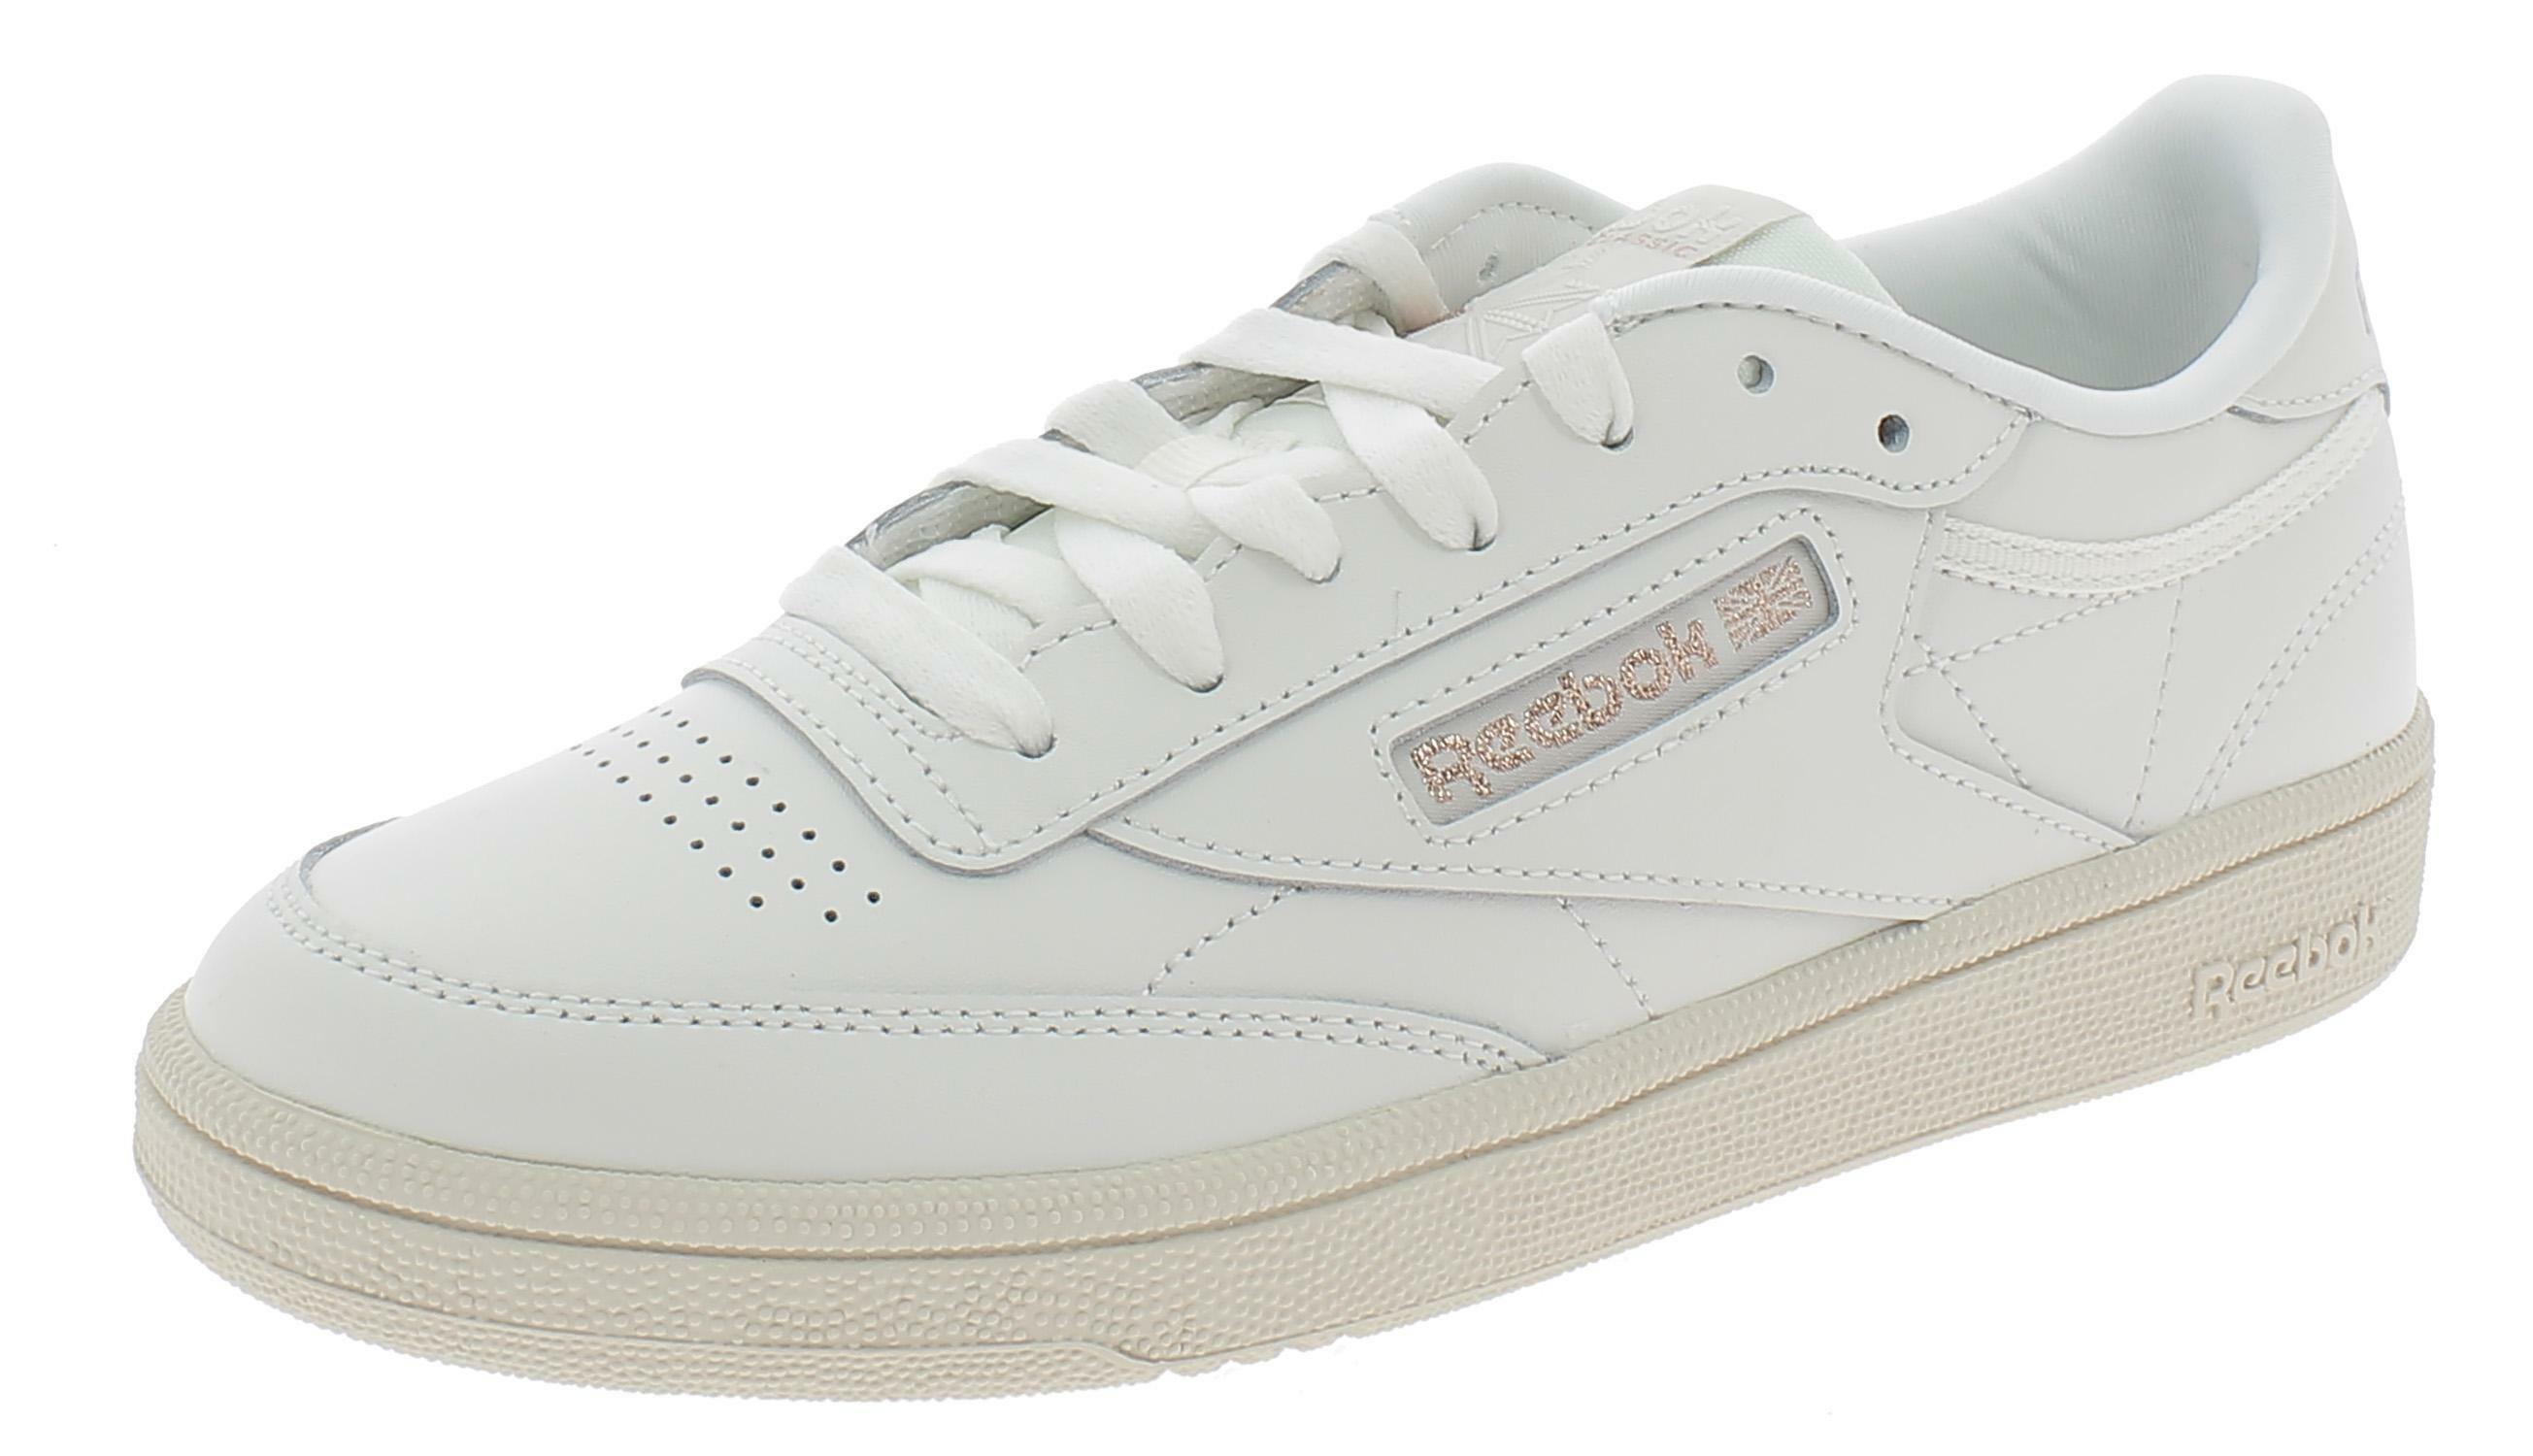 Reebok club c 85 scarpe sportive donna bianche dv3727